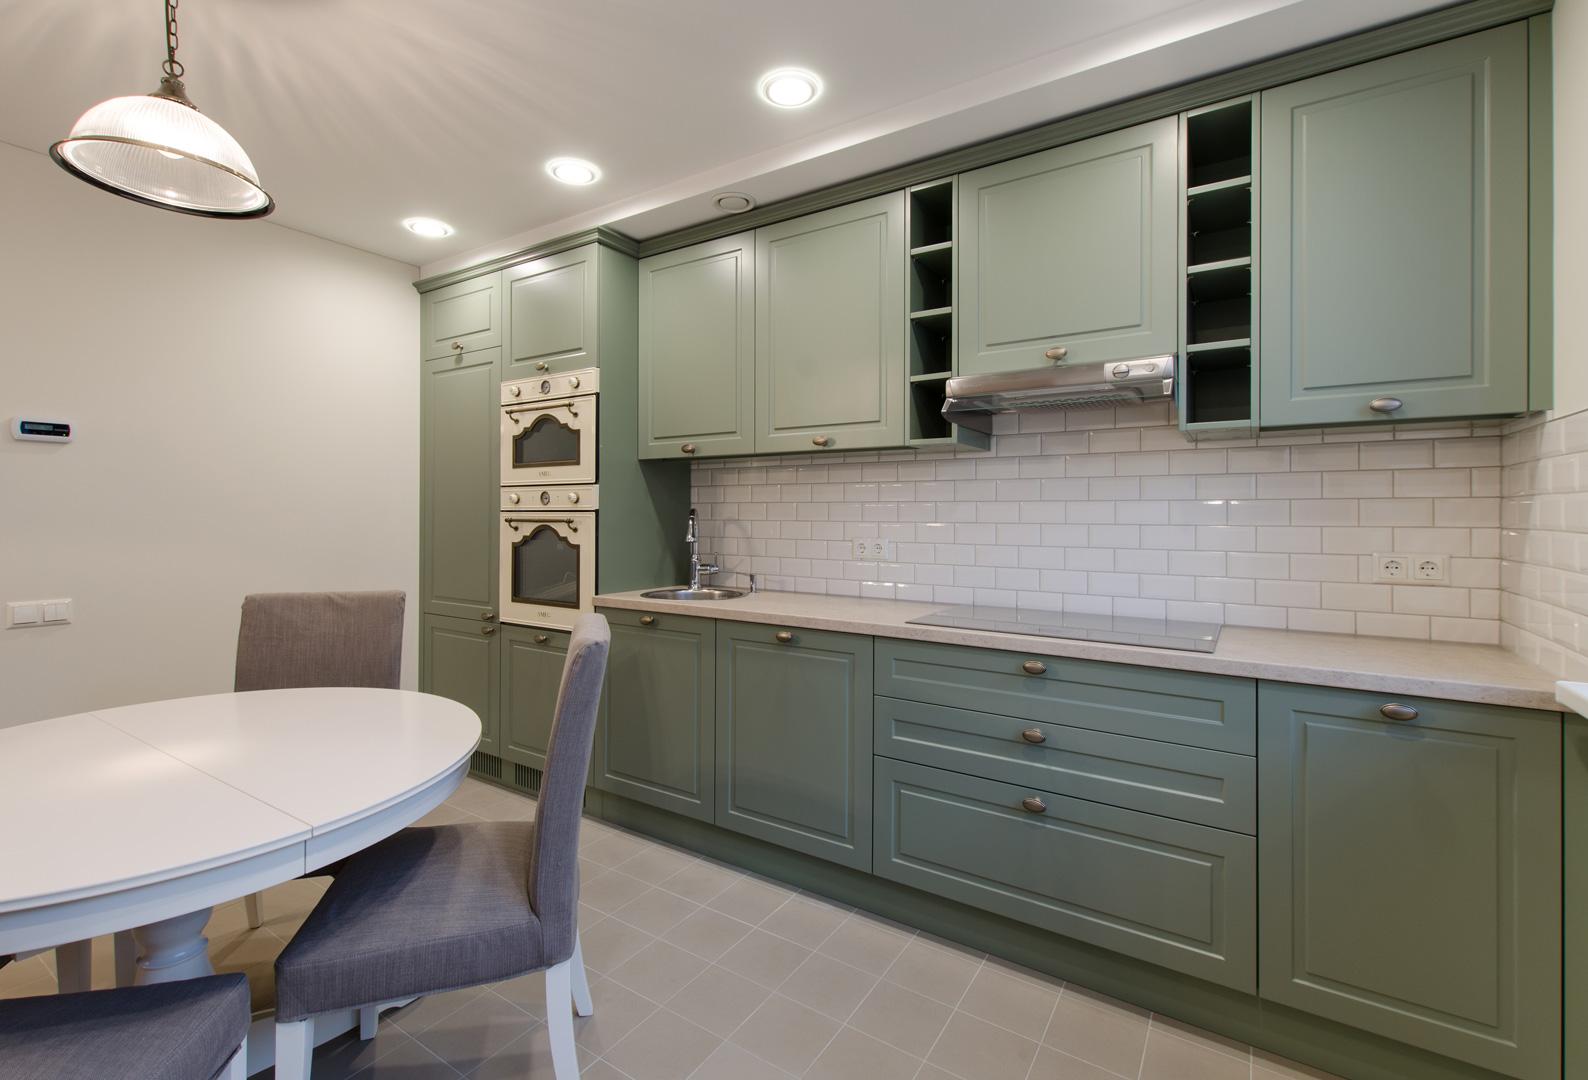 klasikine_moderni_virtuve